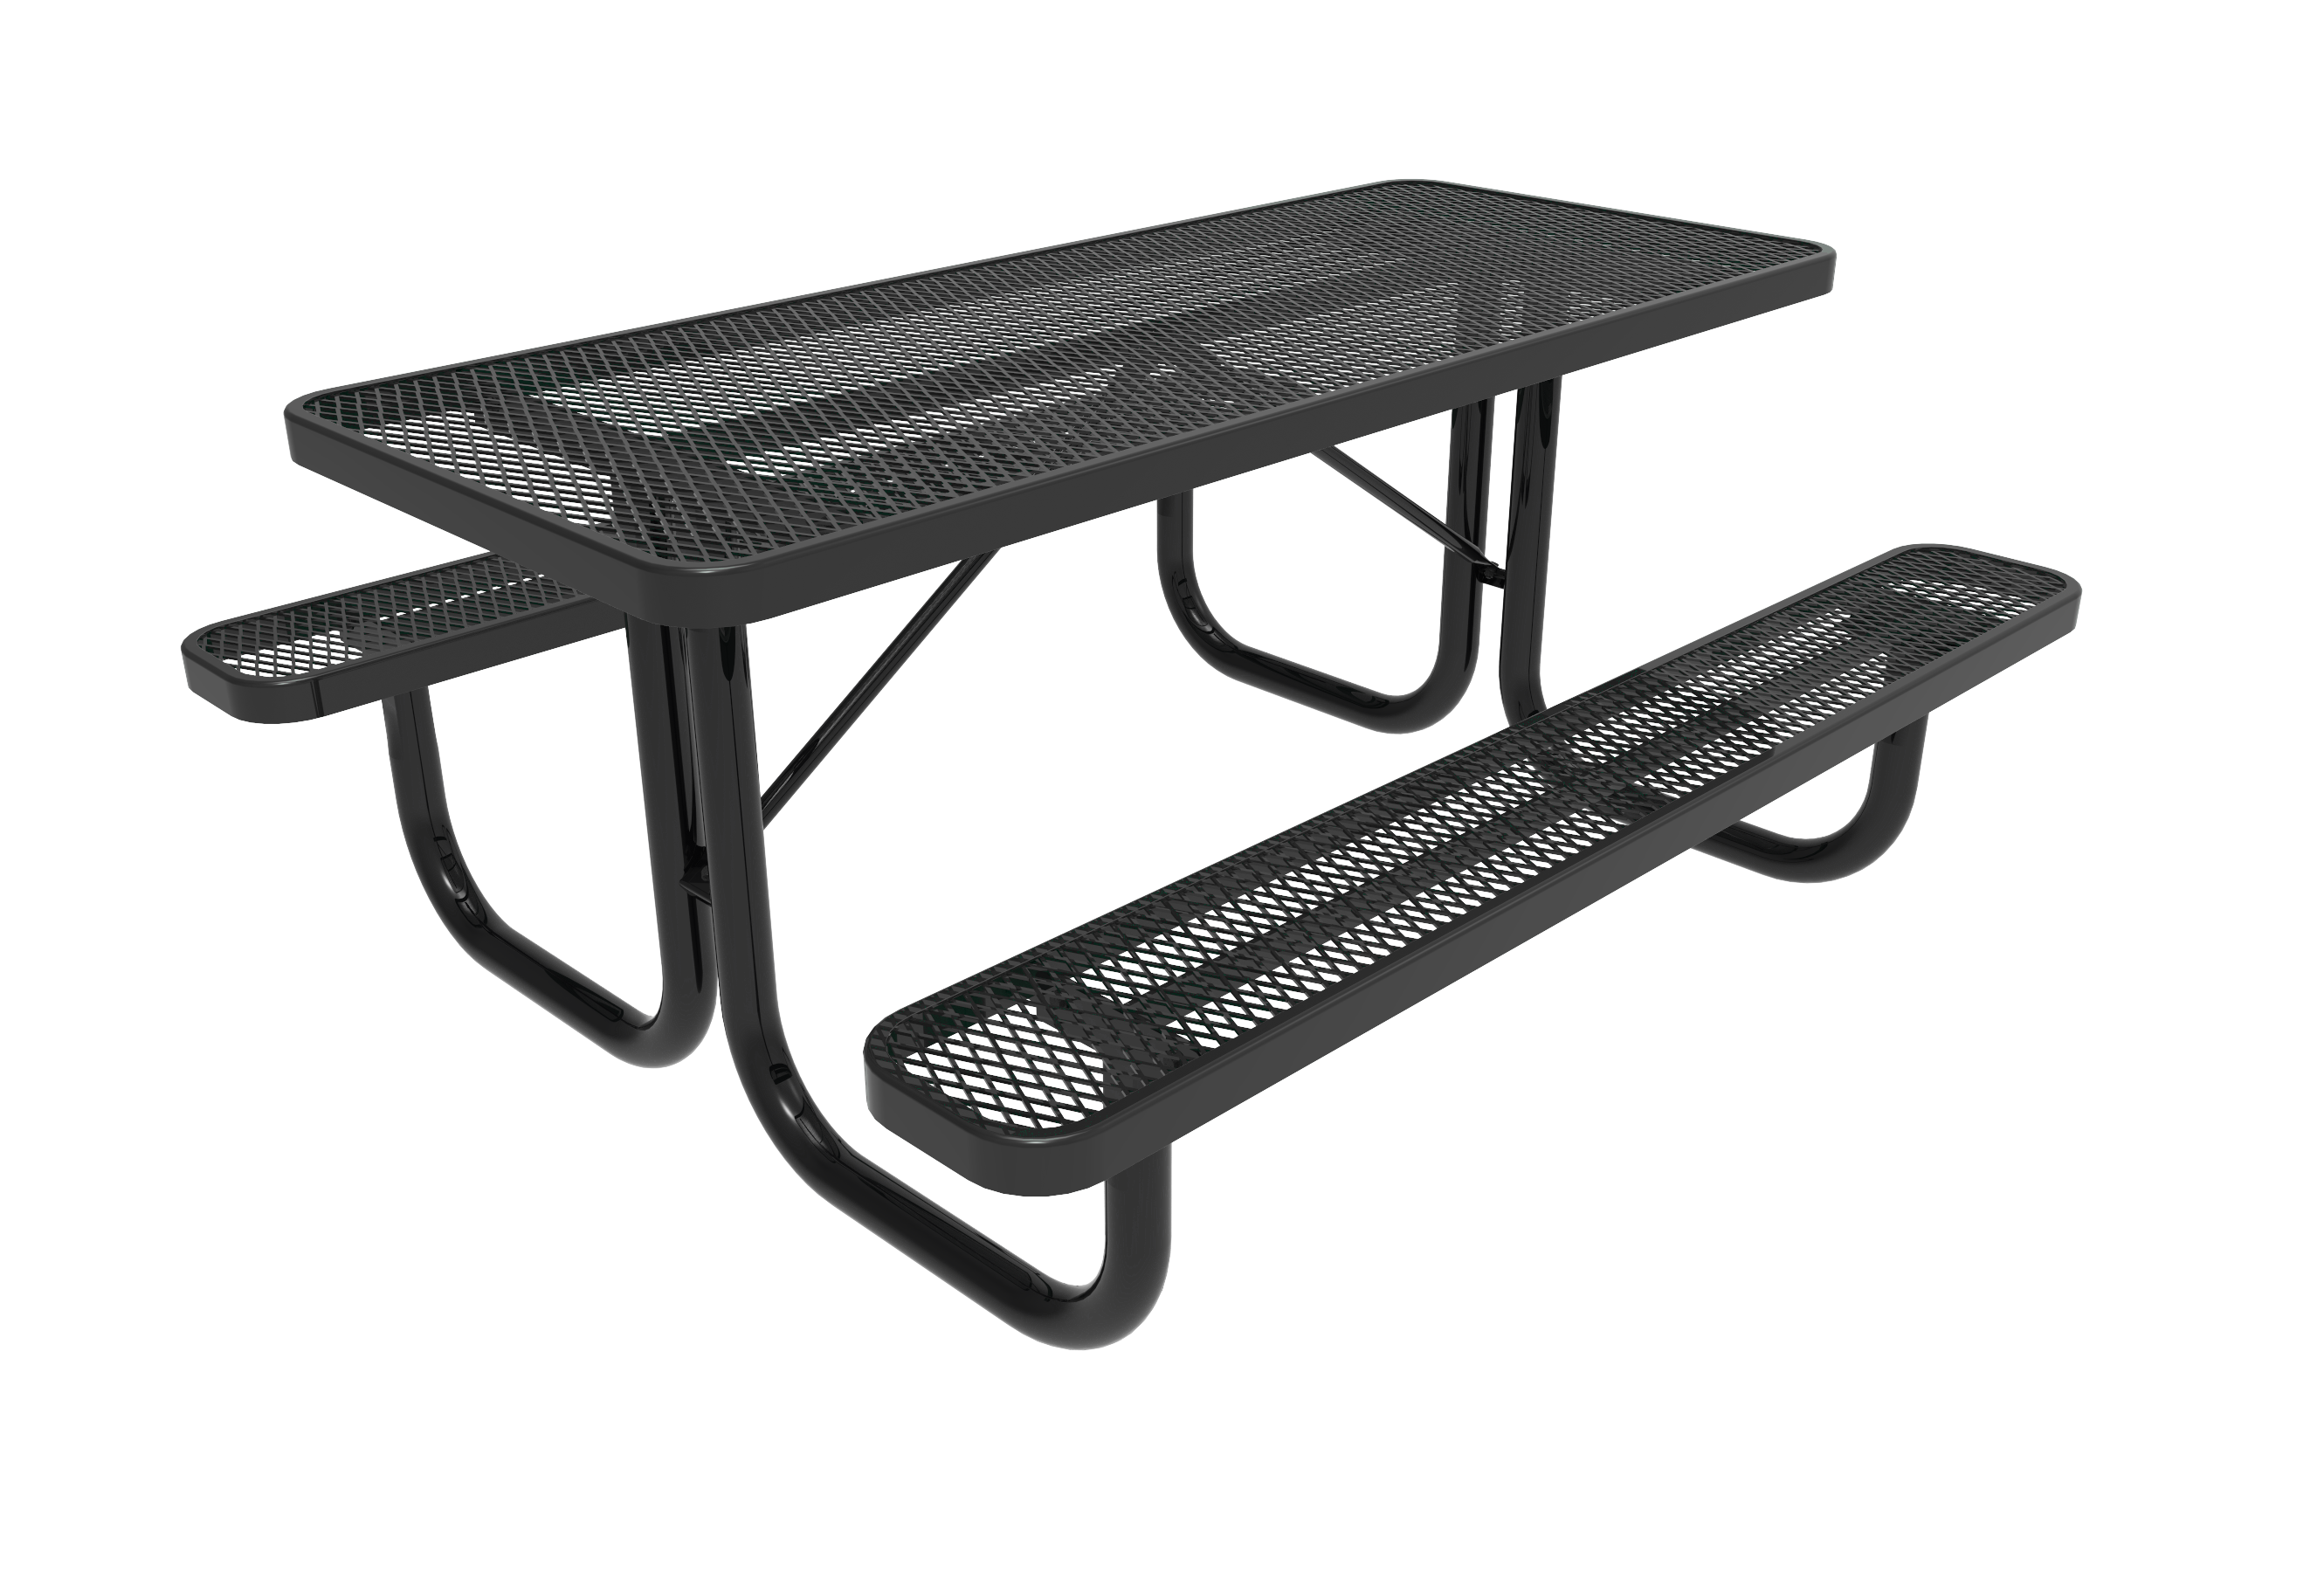 8-Ft. Heavy Duty Rectangular Picnic Table